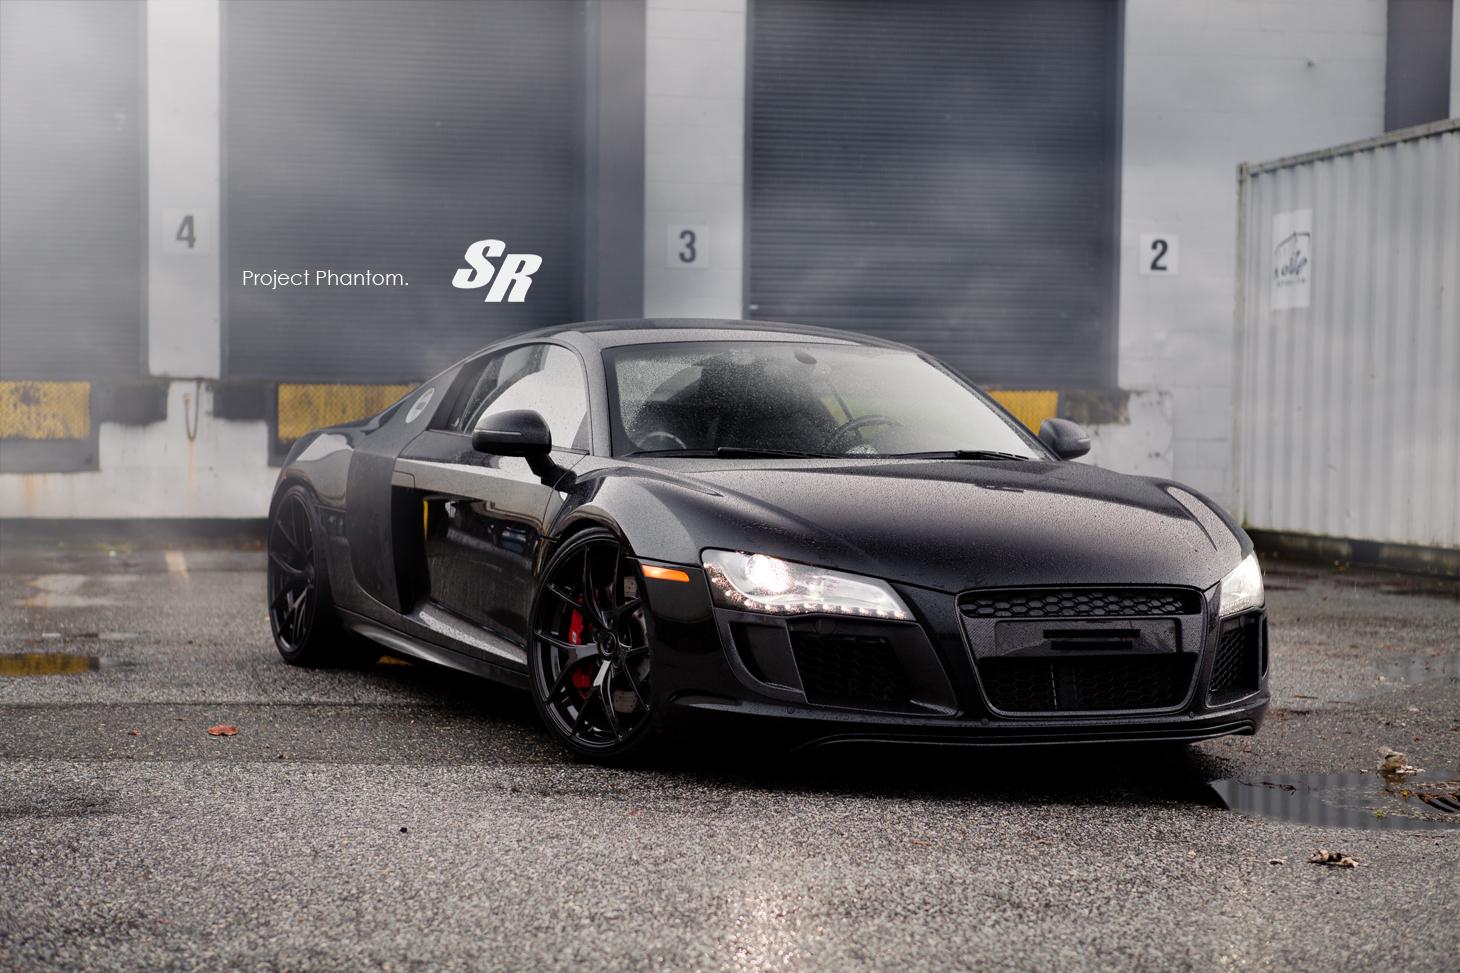 Favori Project Phantom: SR Auto Audi R8 GP33